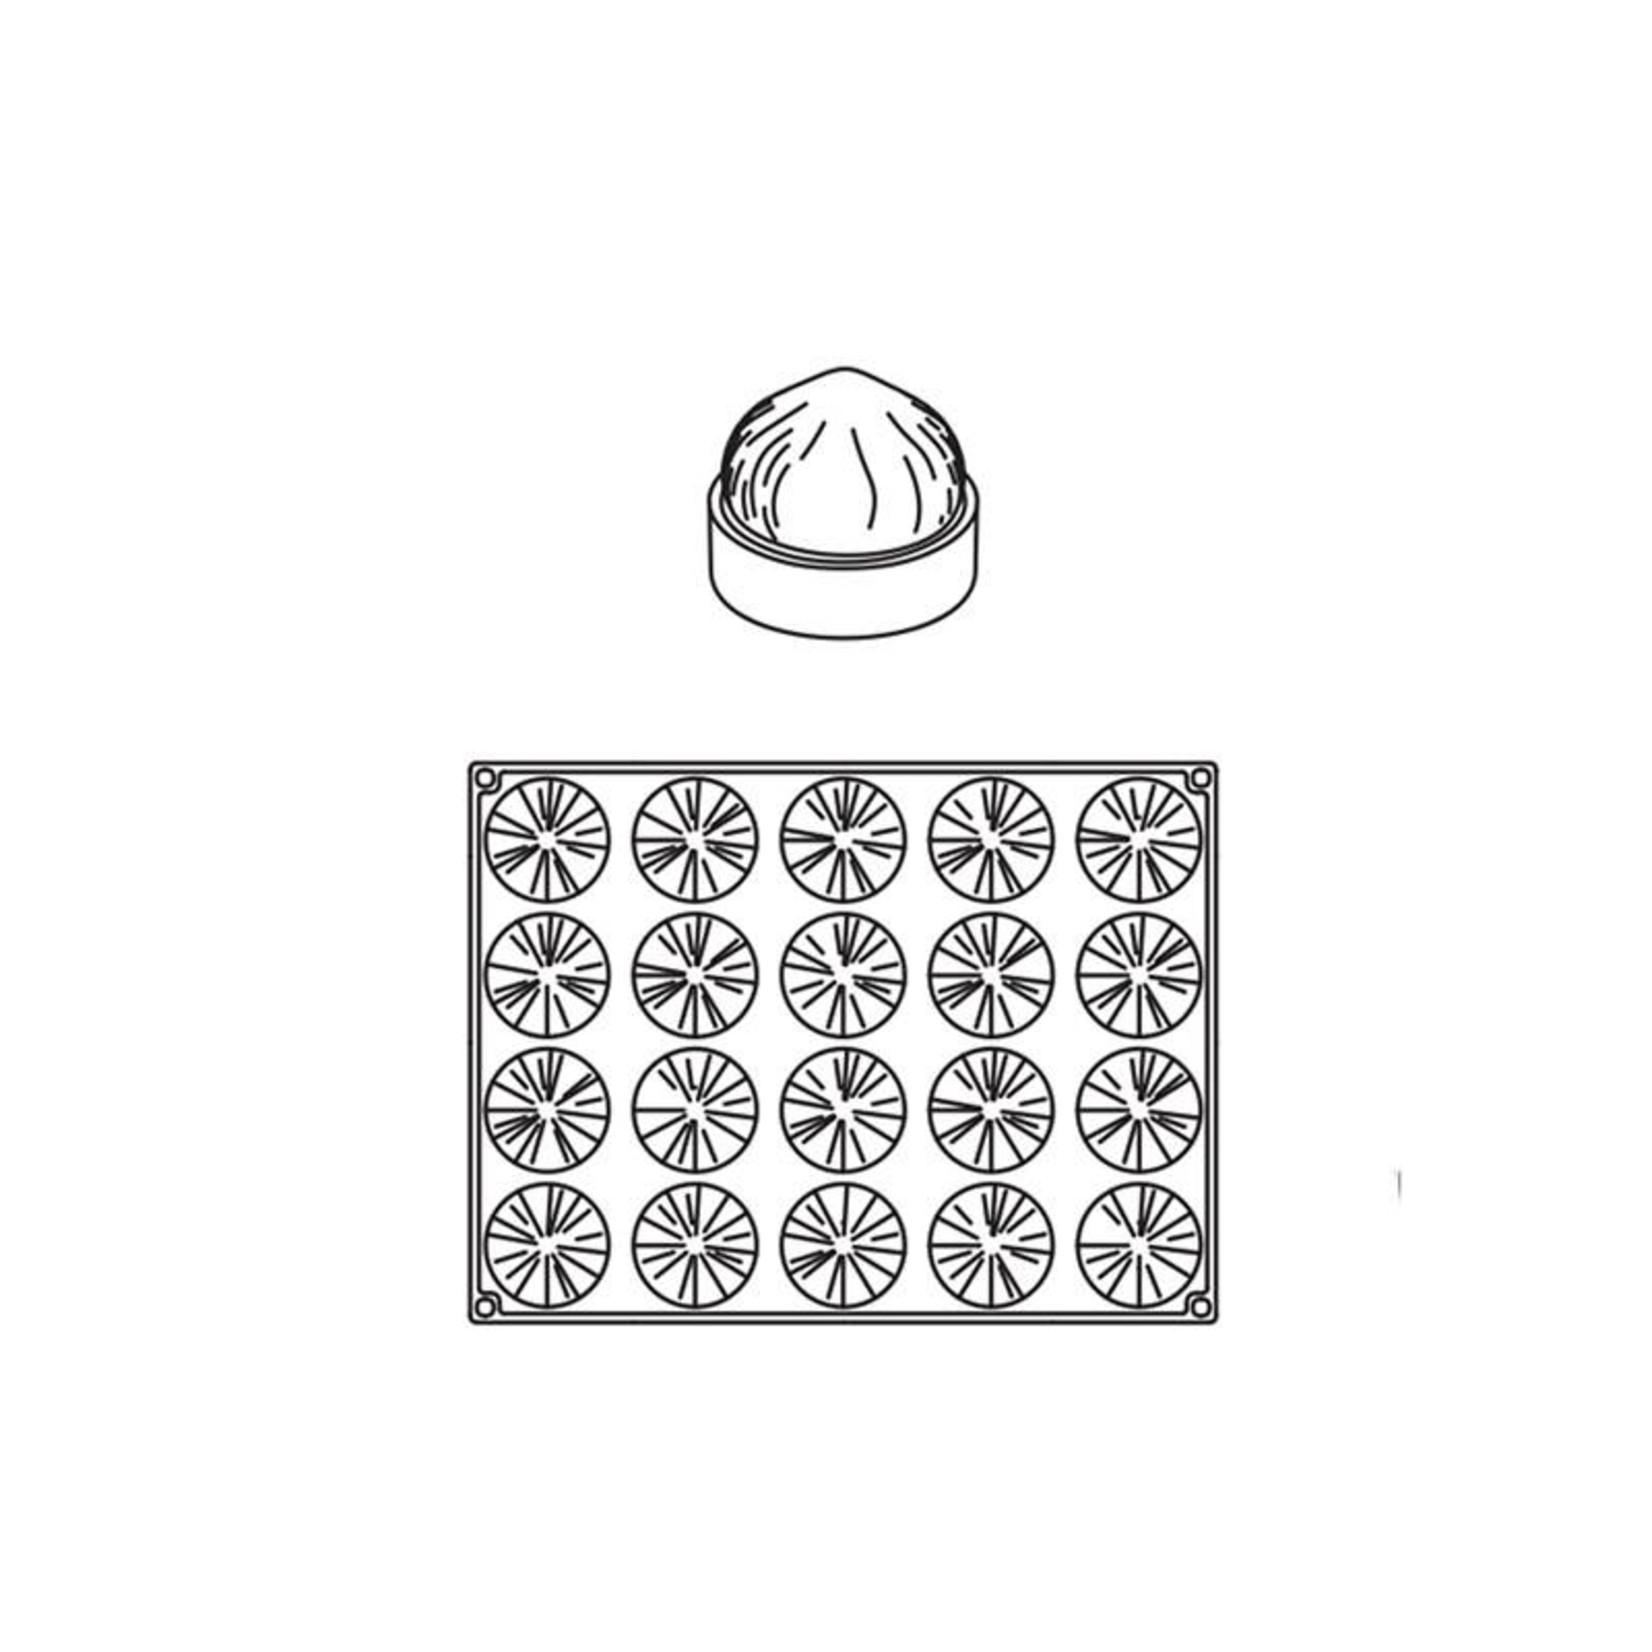 Pavoni Pavoni - Pavoflex silicone mold, Hazelnut (20 cavity), PX4358